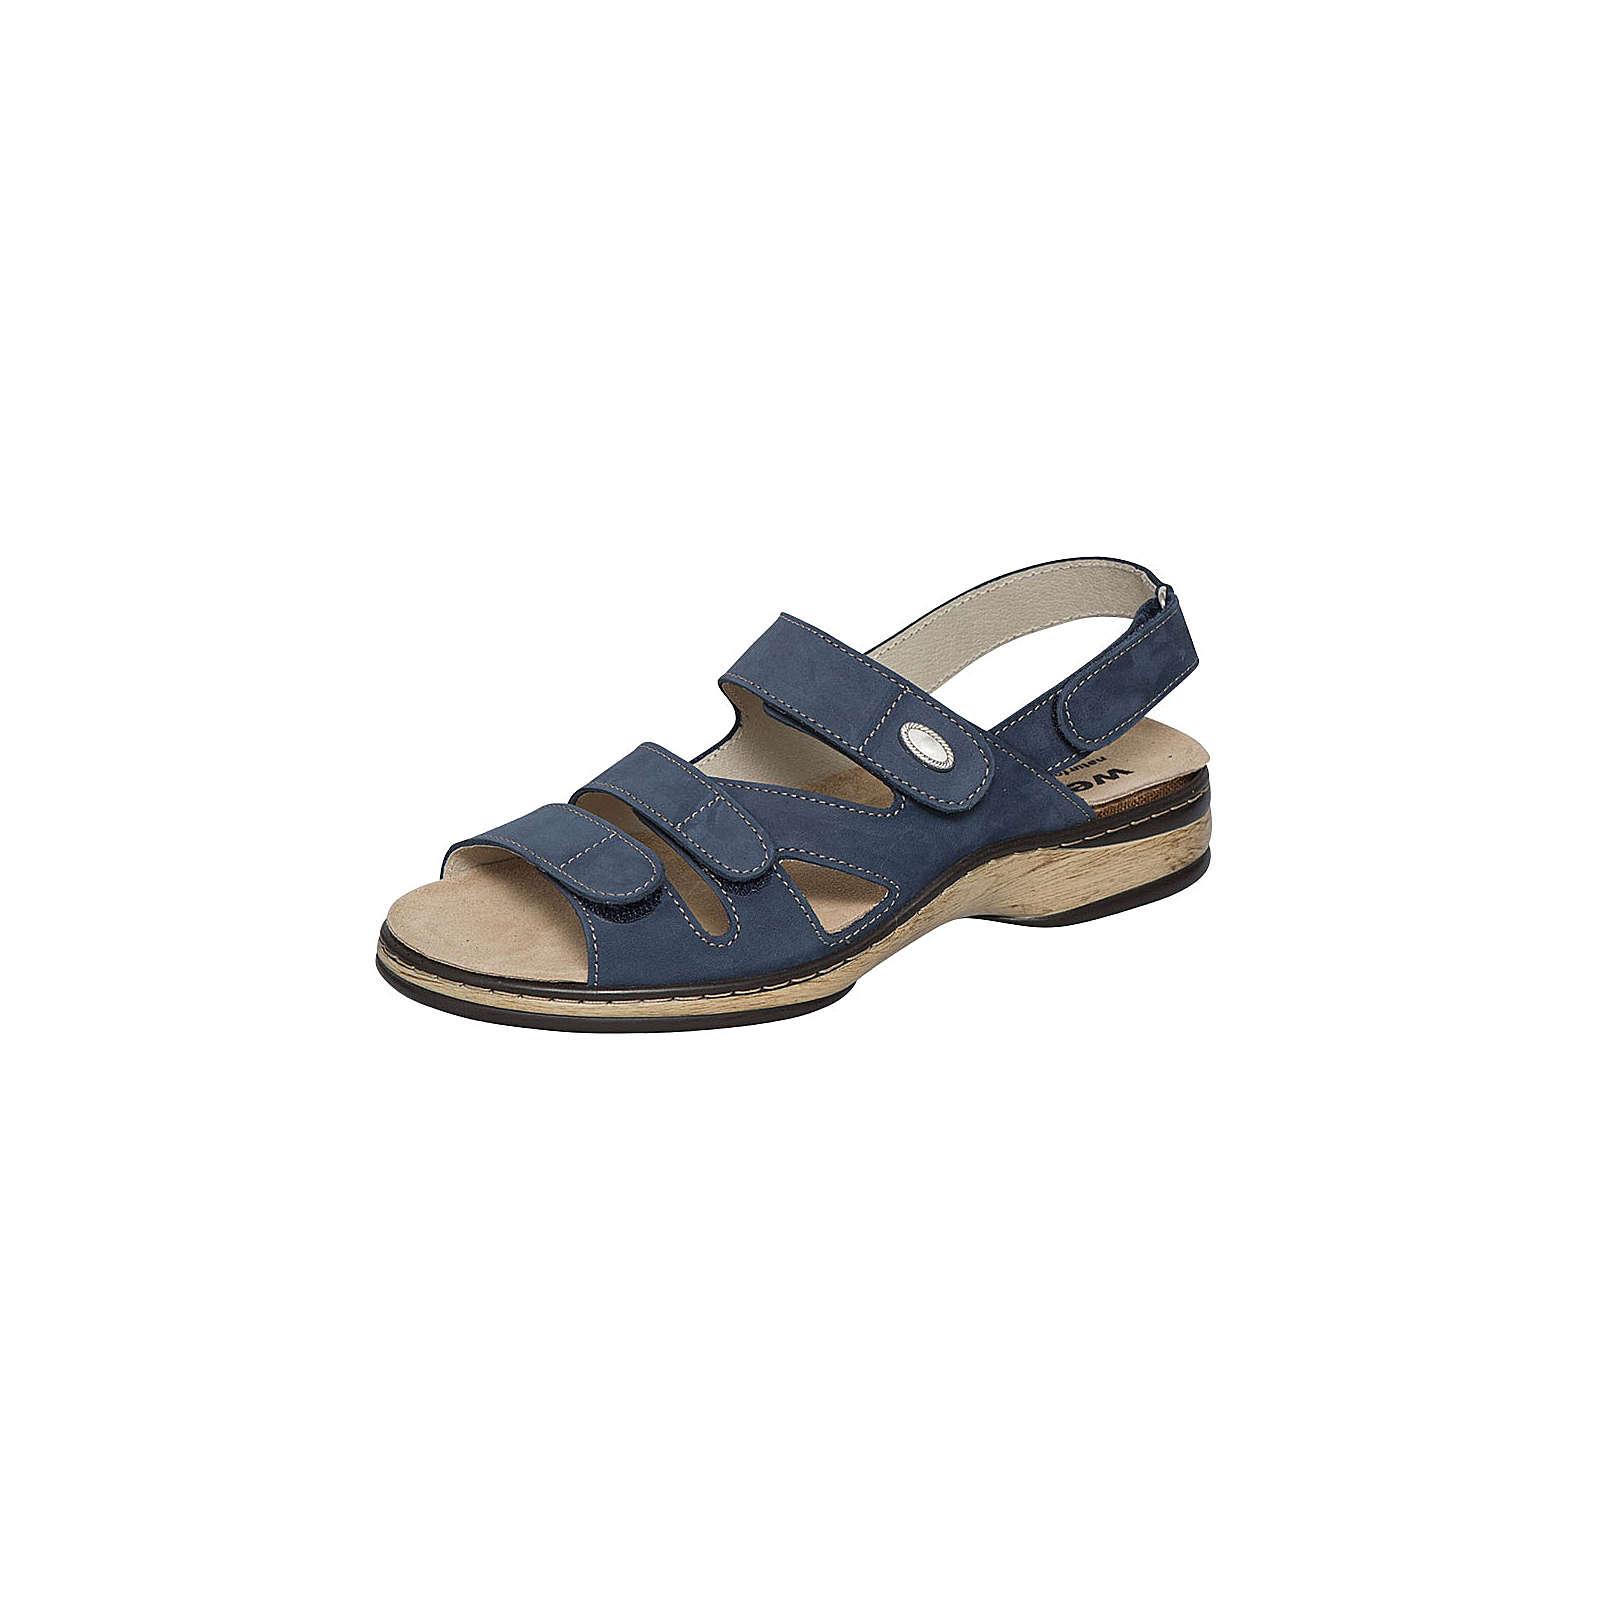 Weeger Komfort-Sandalen blau Damen Gr. 38